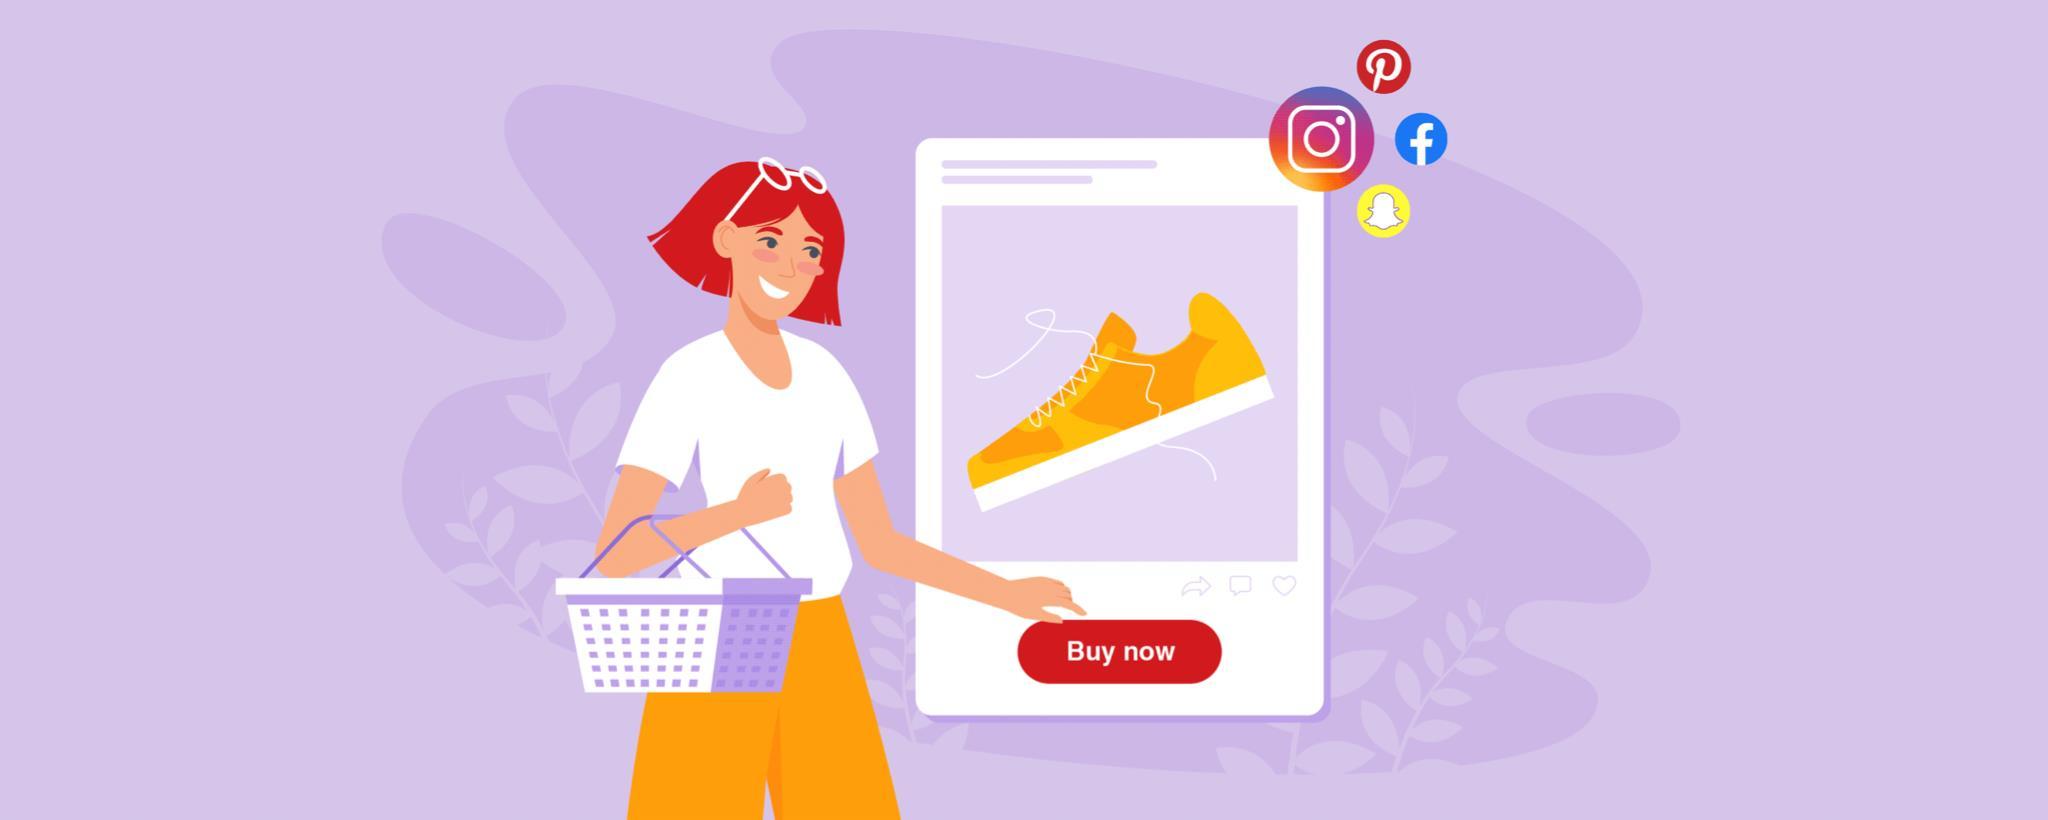 what is a social commerce platform